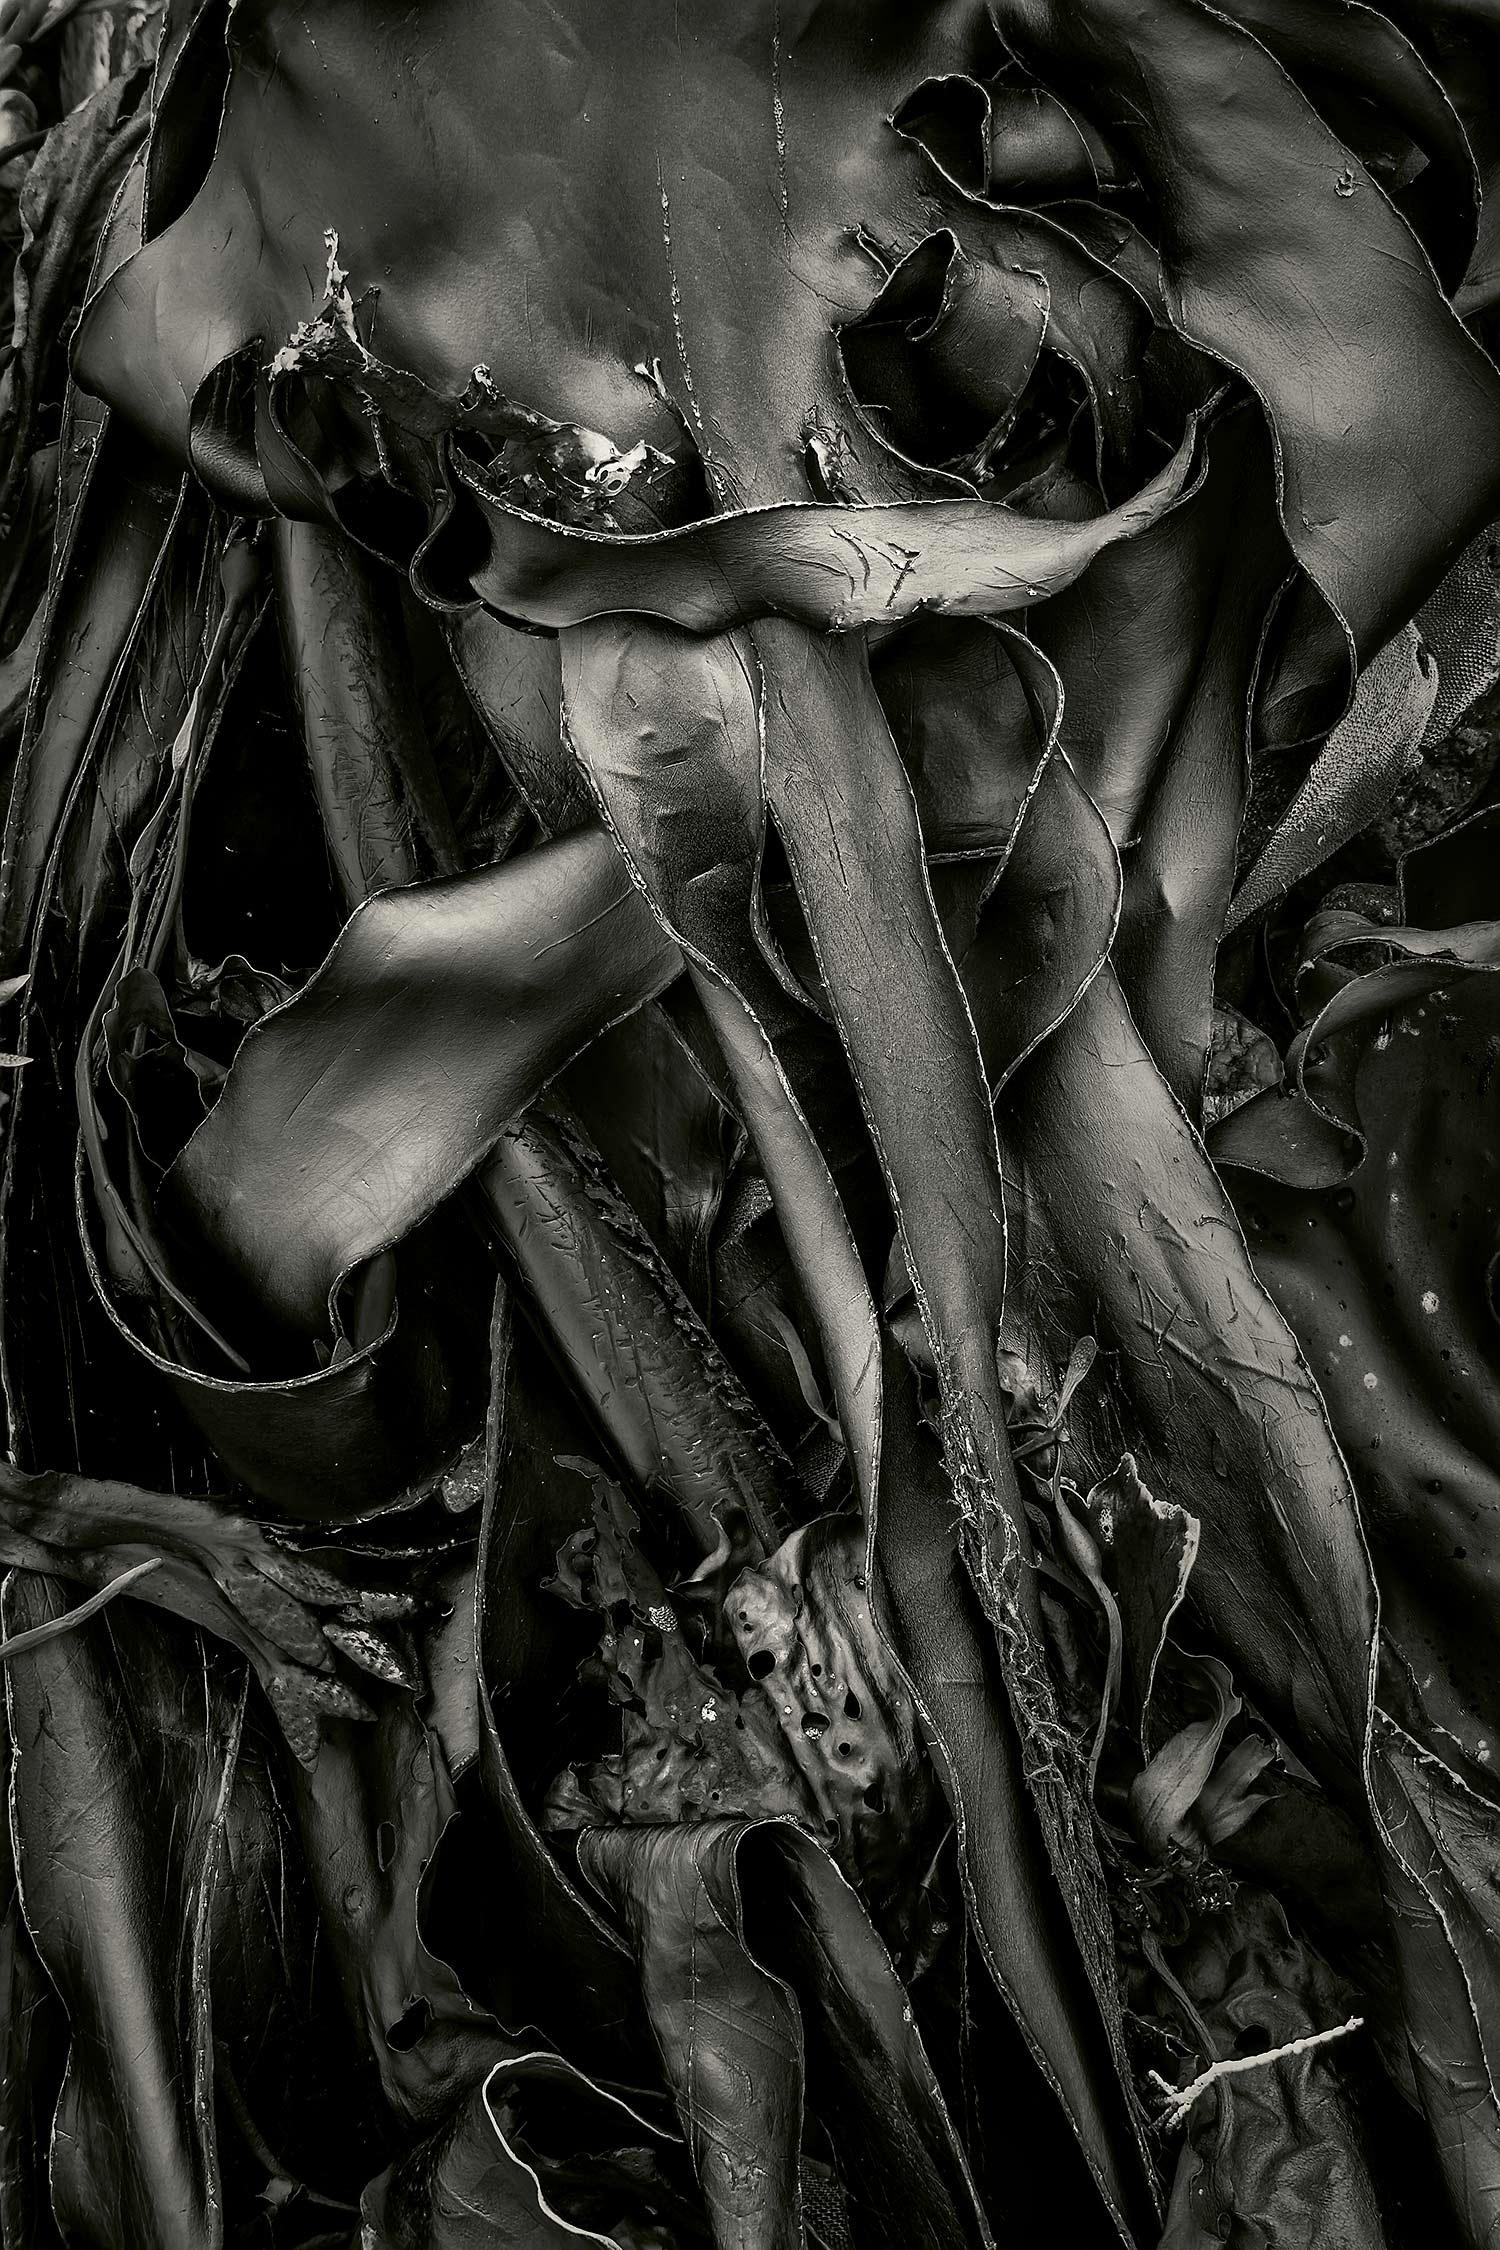 Seaweed 569, Seawall, Maine, 2012